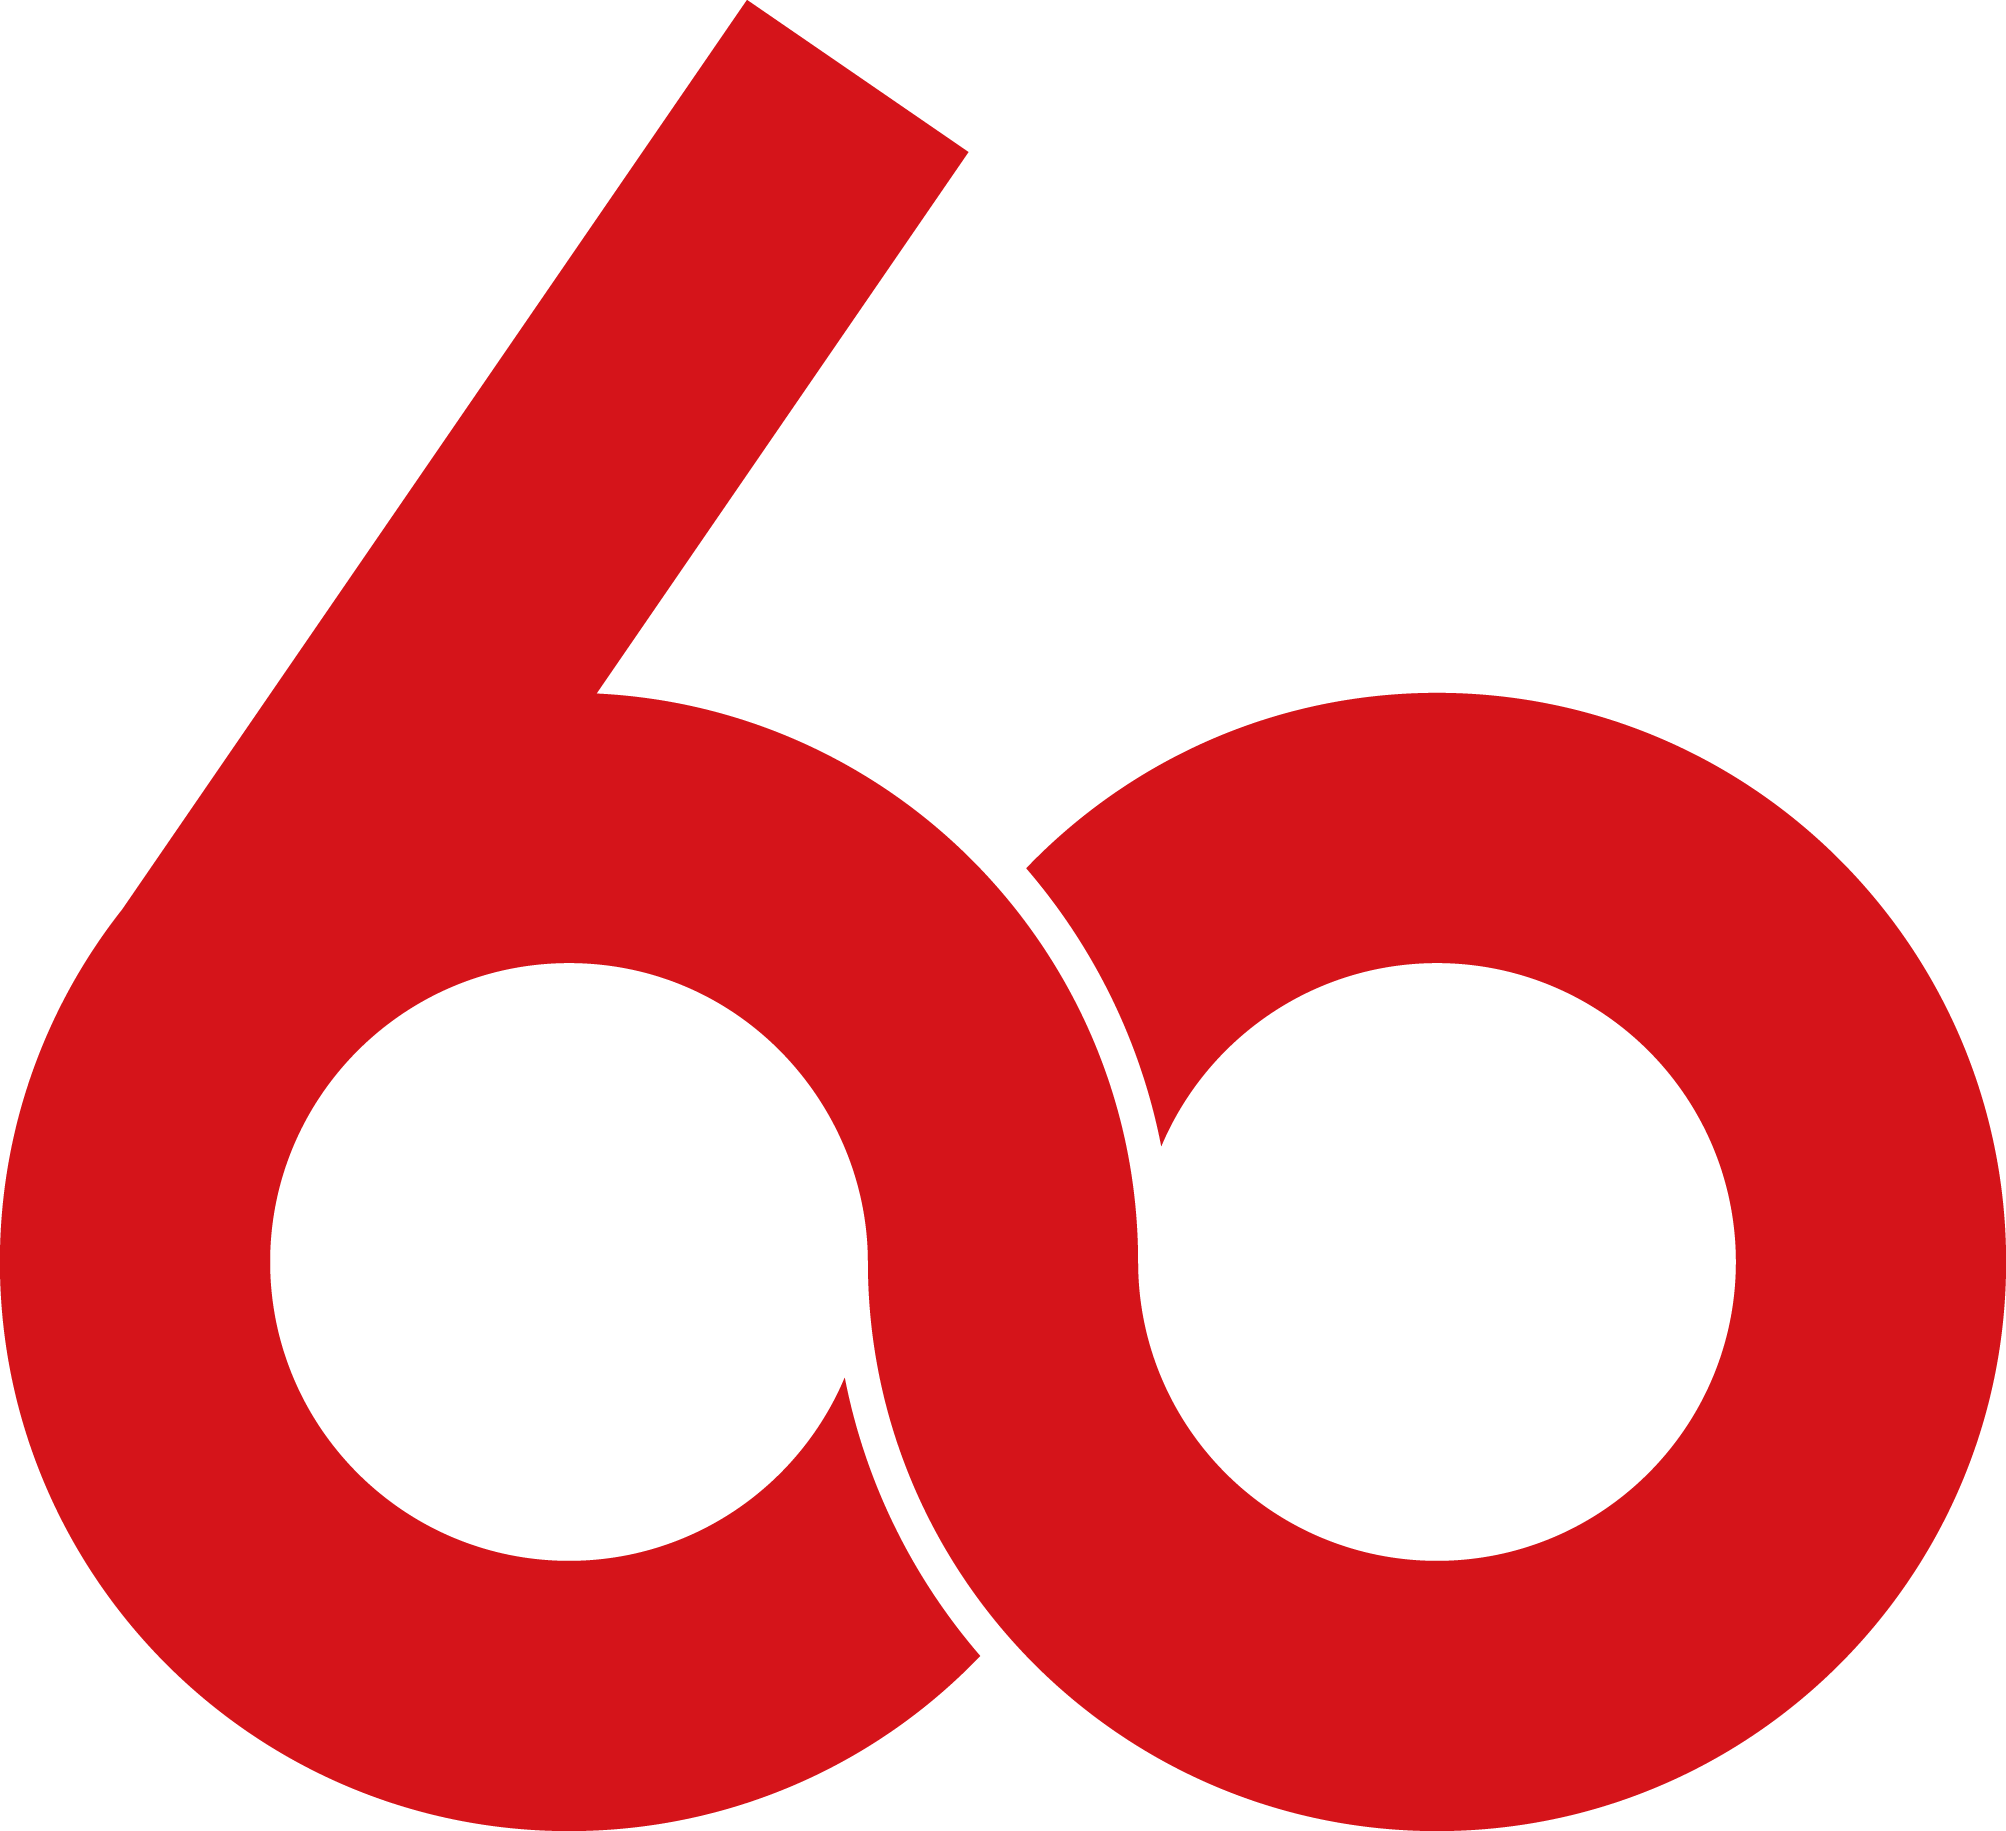 Cliparts zum 60 geburtstag svg black and white download Clip Art 60 Geburtstag - Clipart &vector Labs :) • svg black and white download